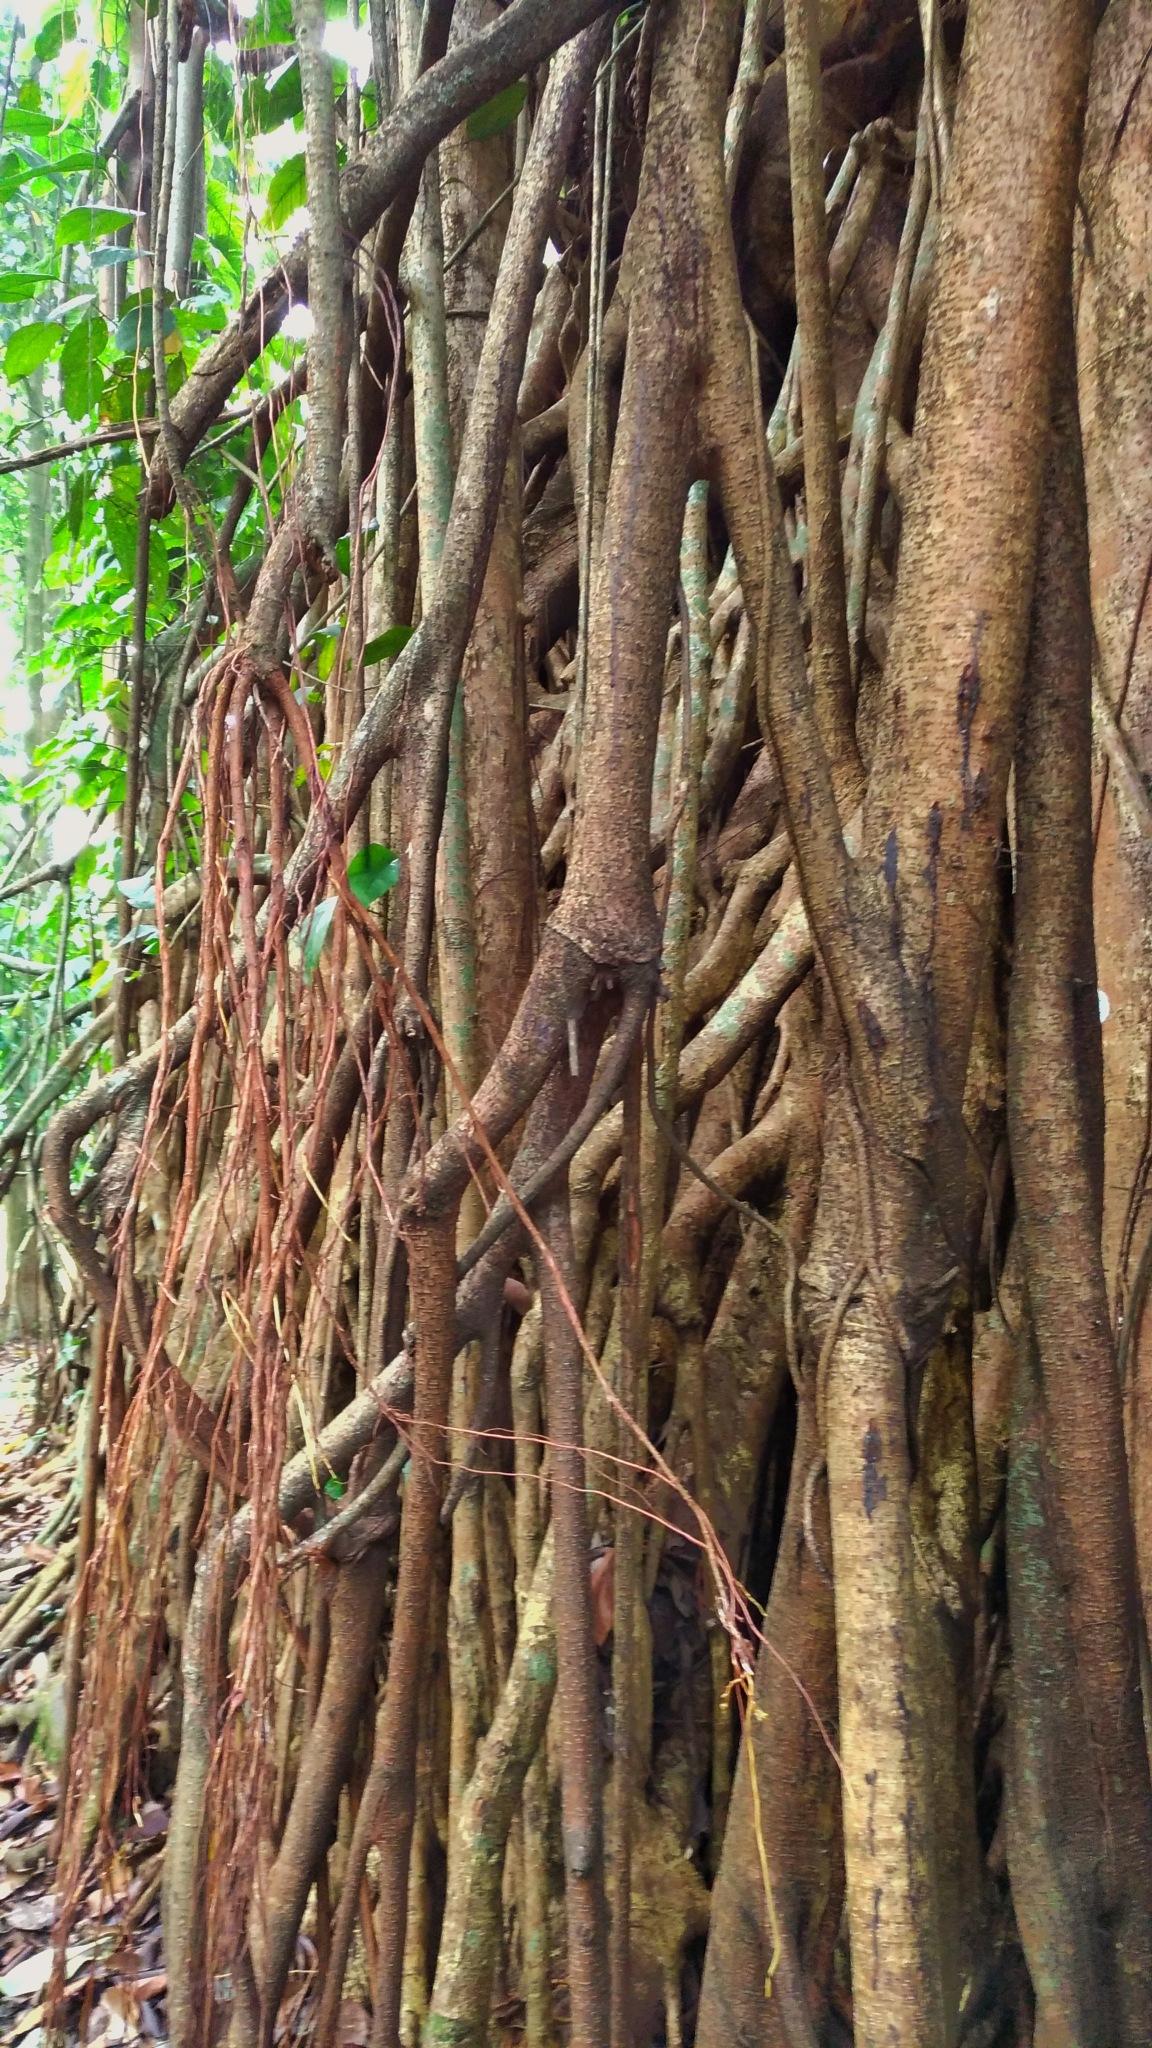 Hanging Roots by Bavner Donaldo